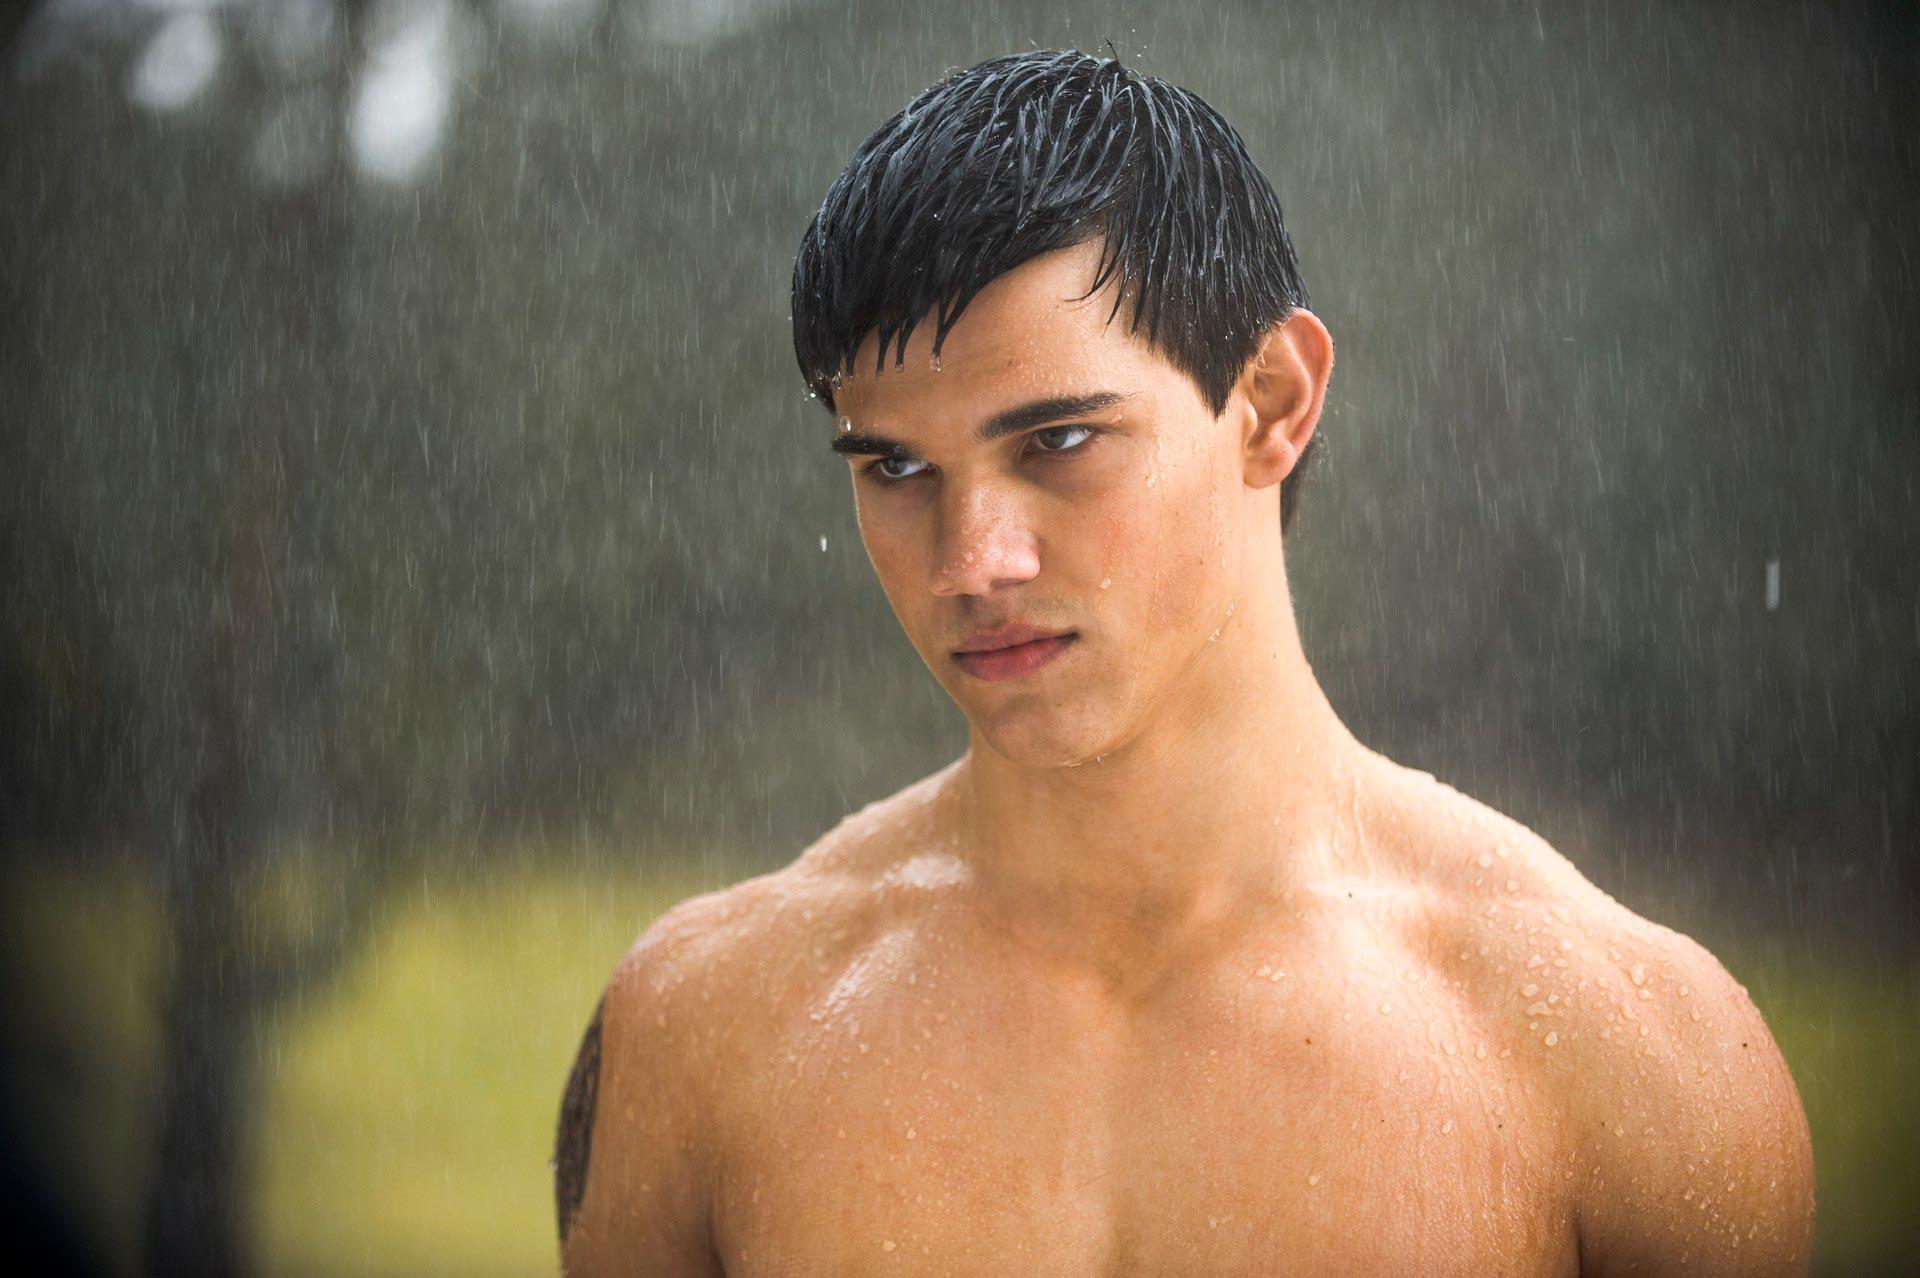 Taylor Lautner as Jacob Black